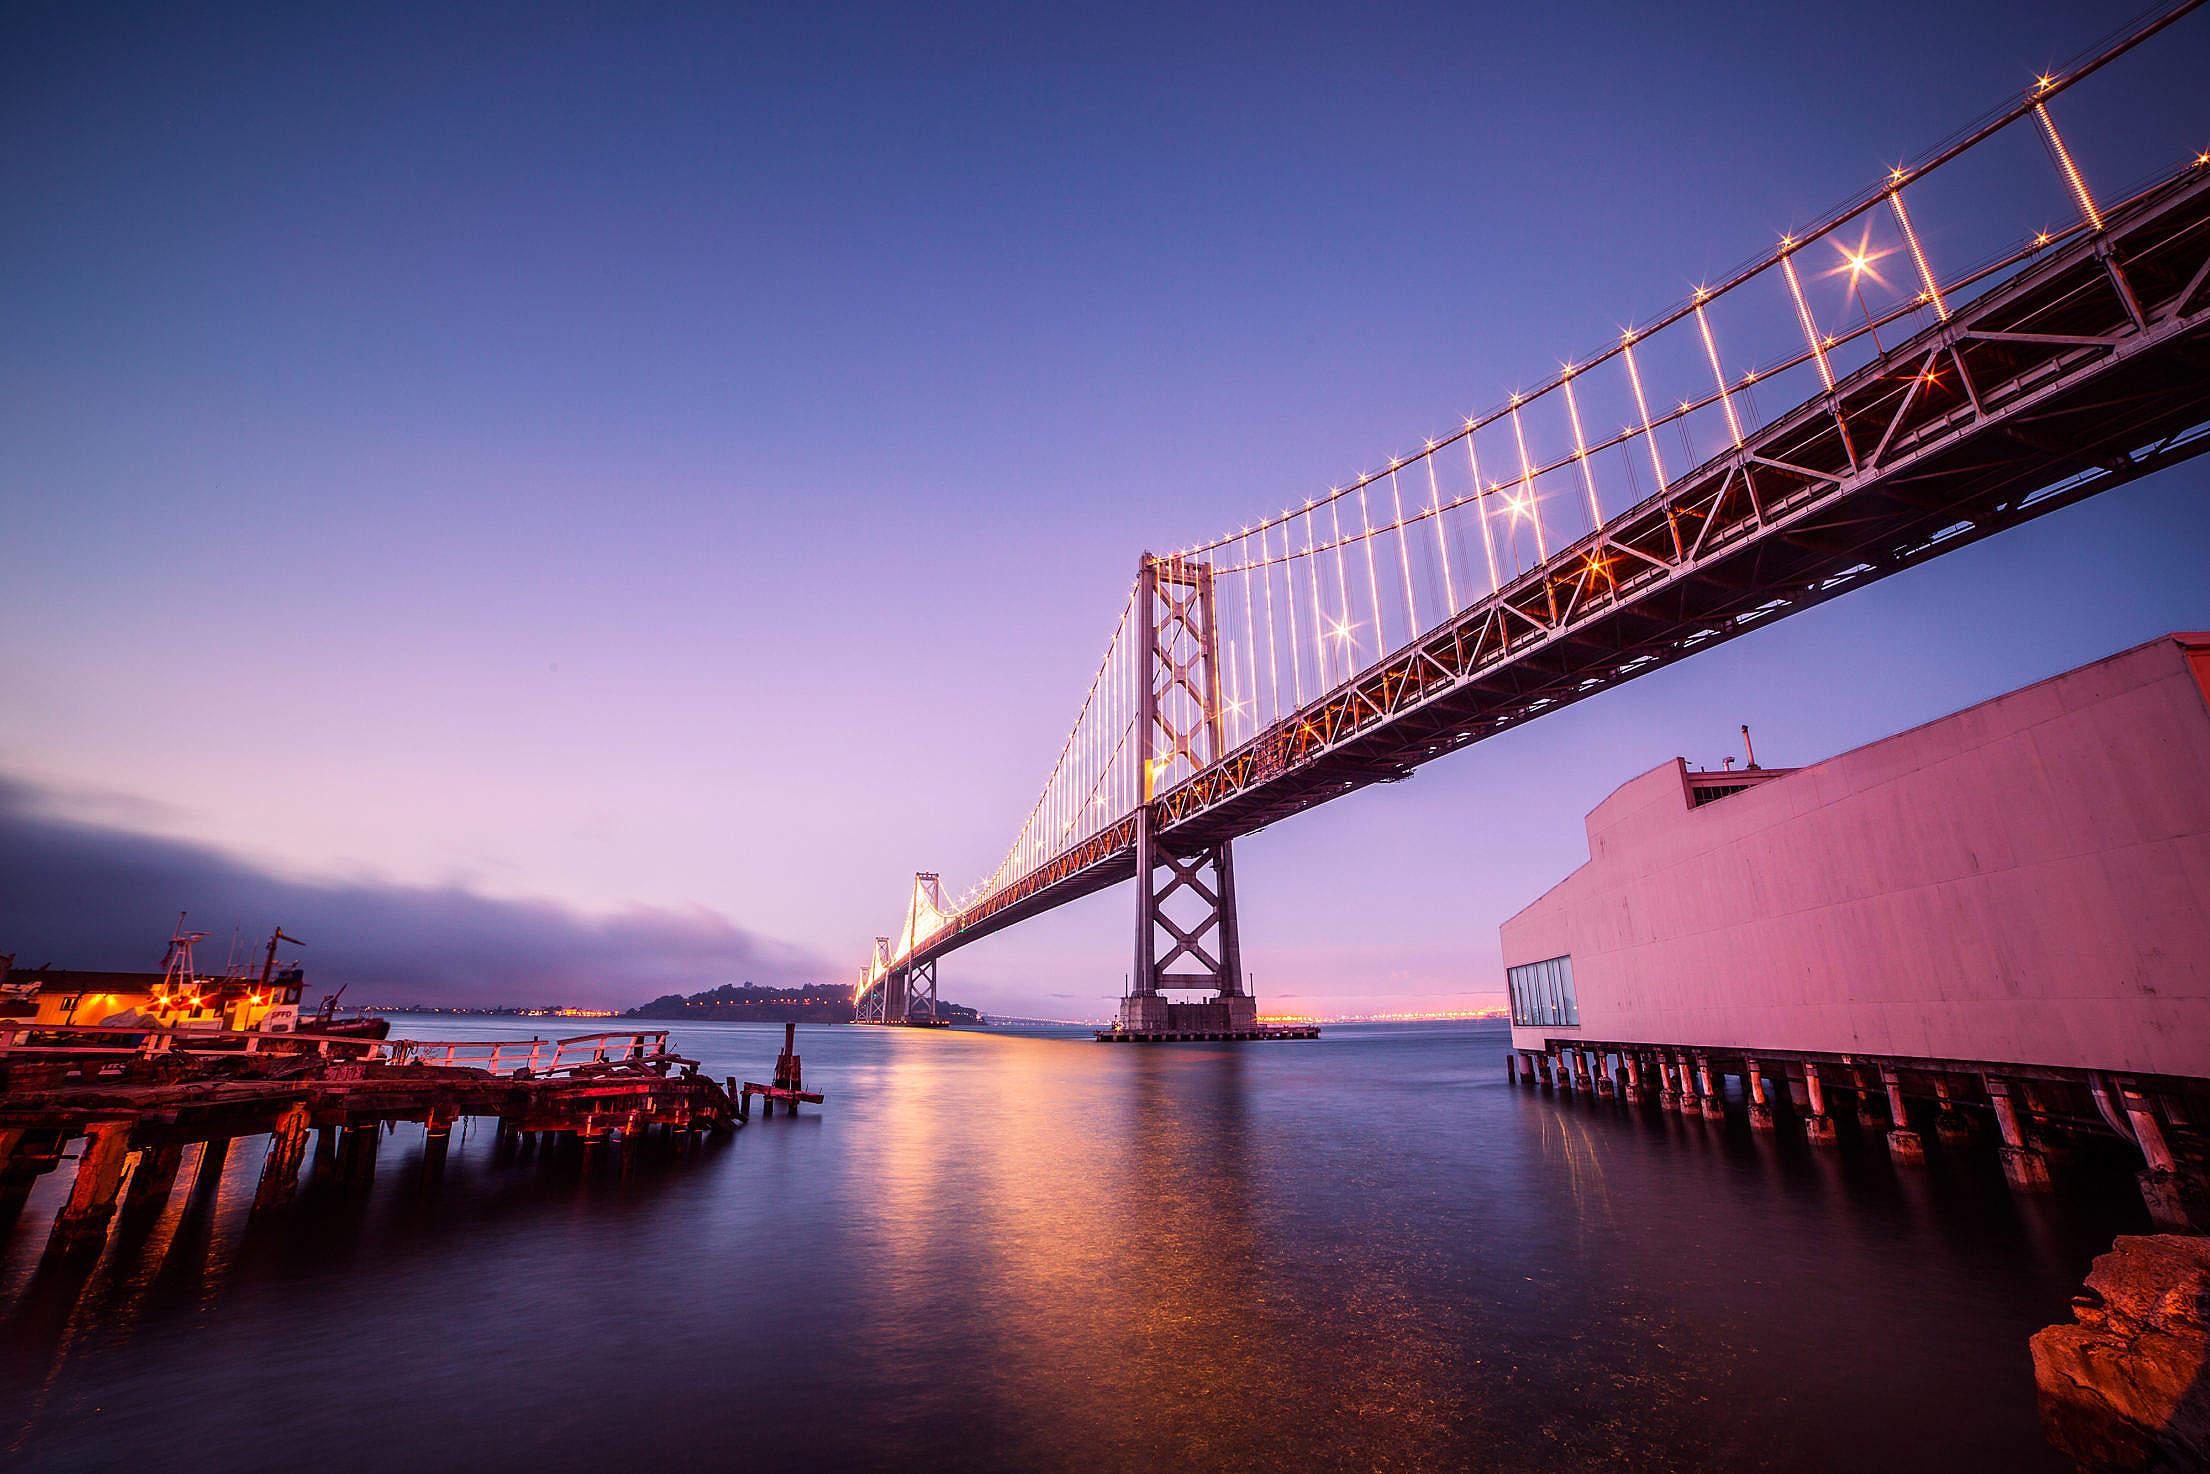 Bay Bridge with Treasure Island in San Francisco At Night Free Stock Photo